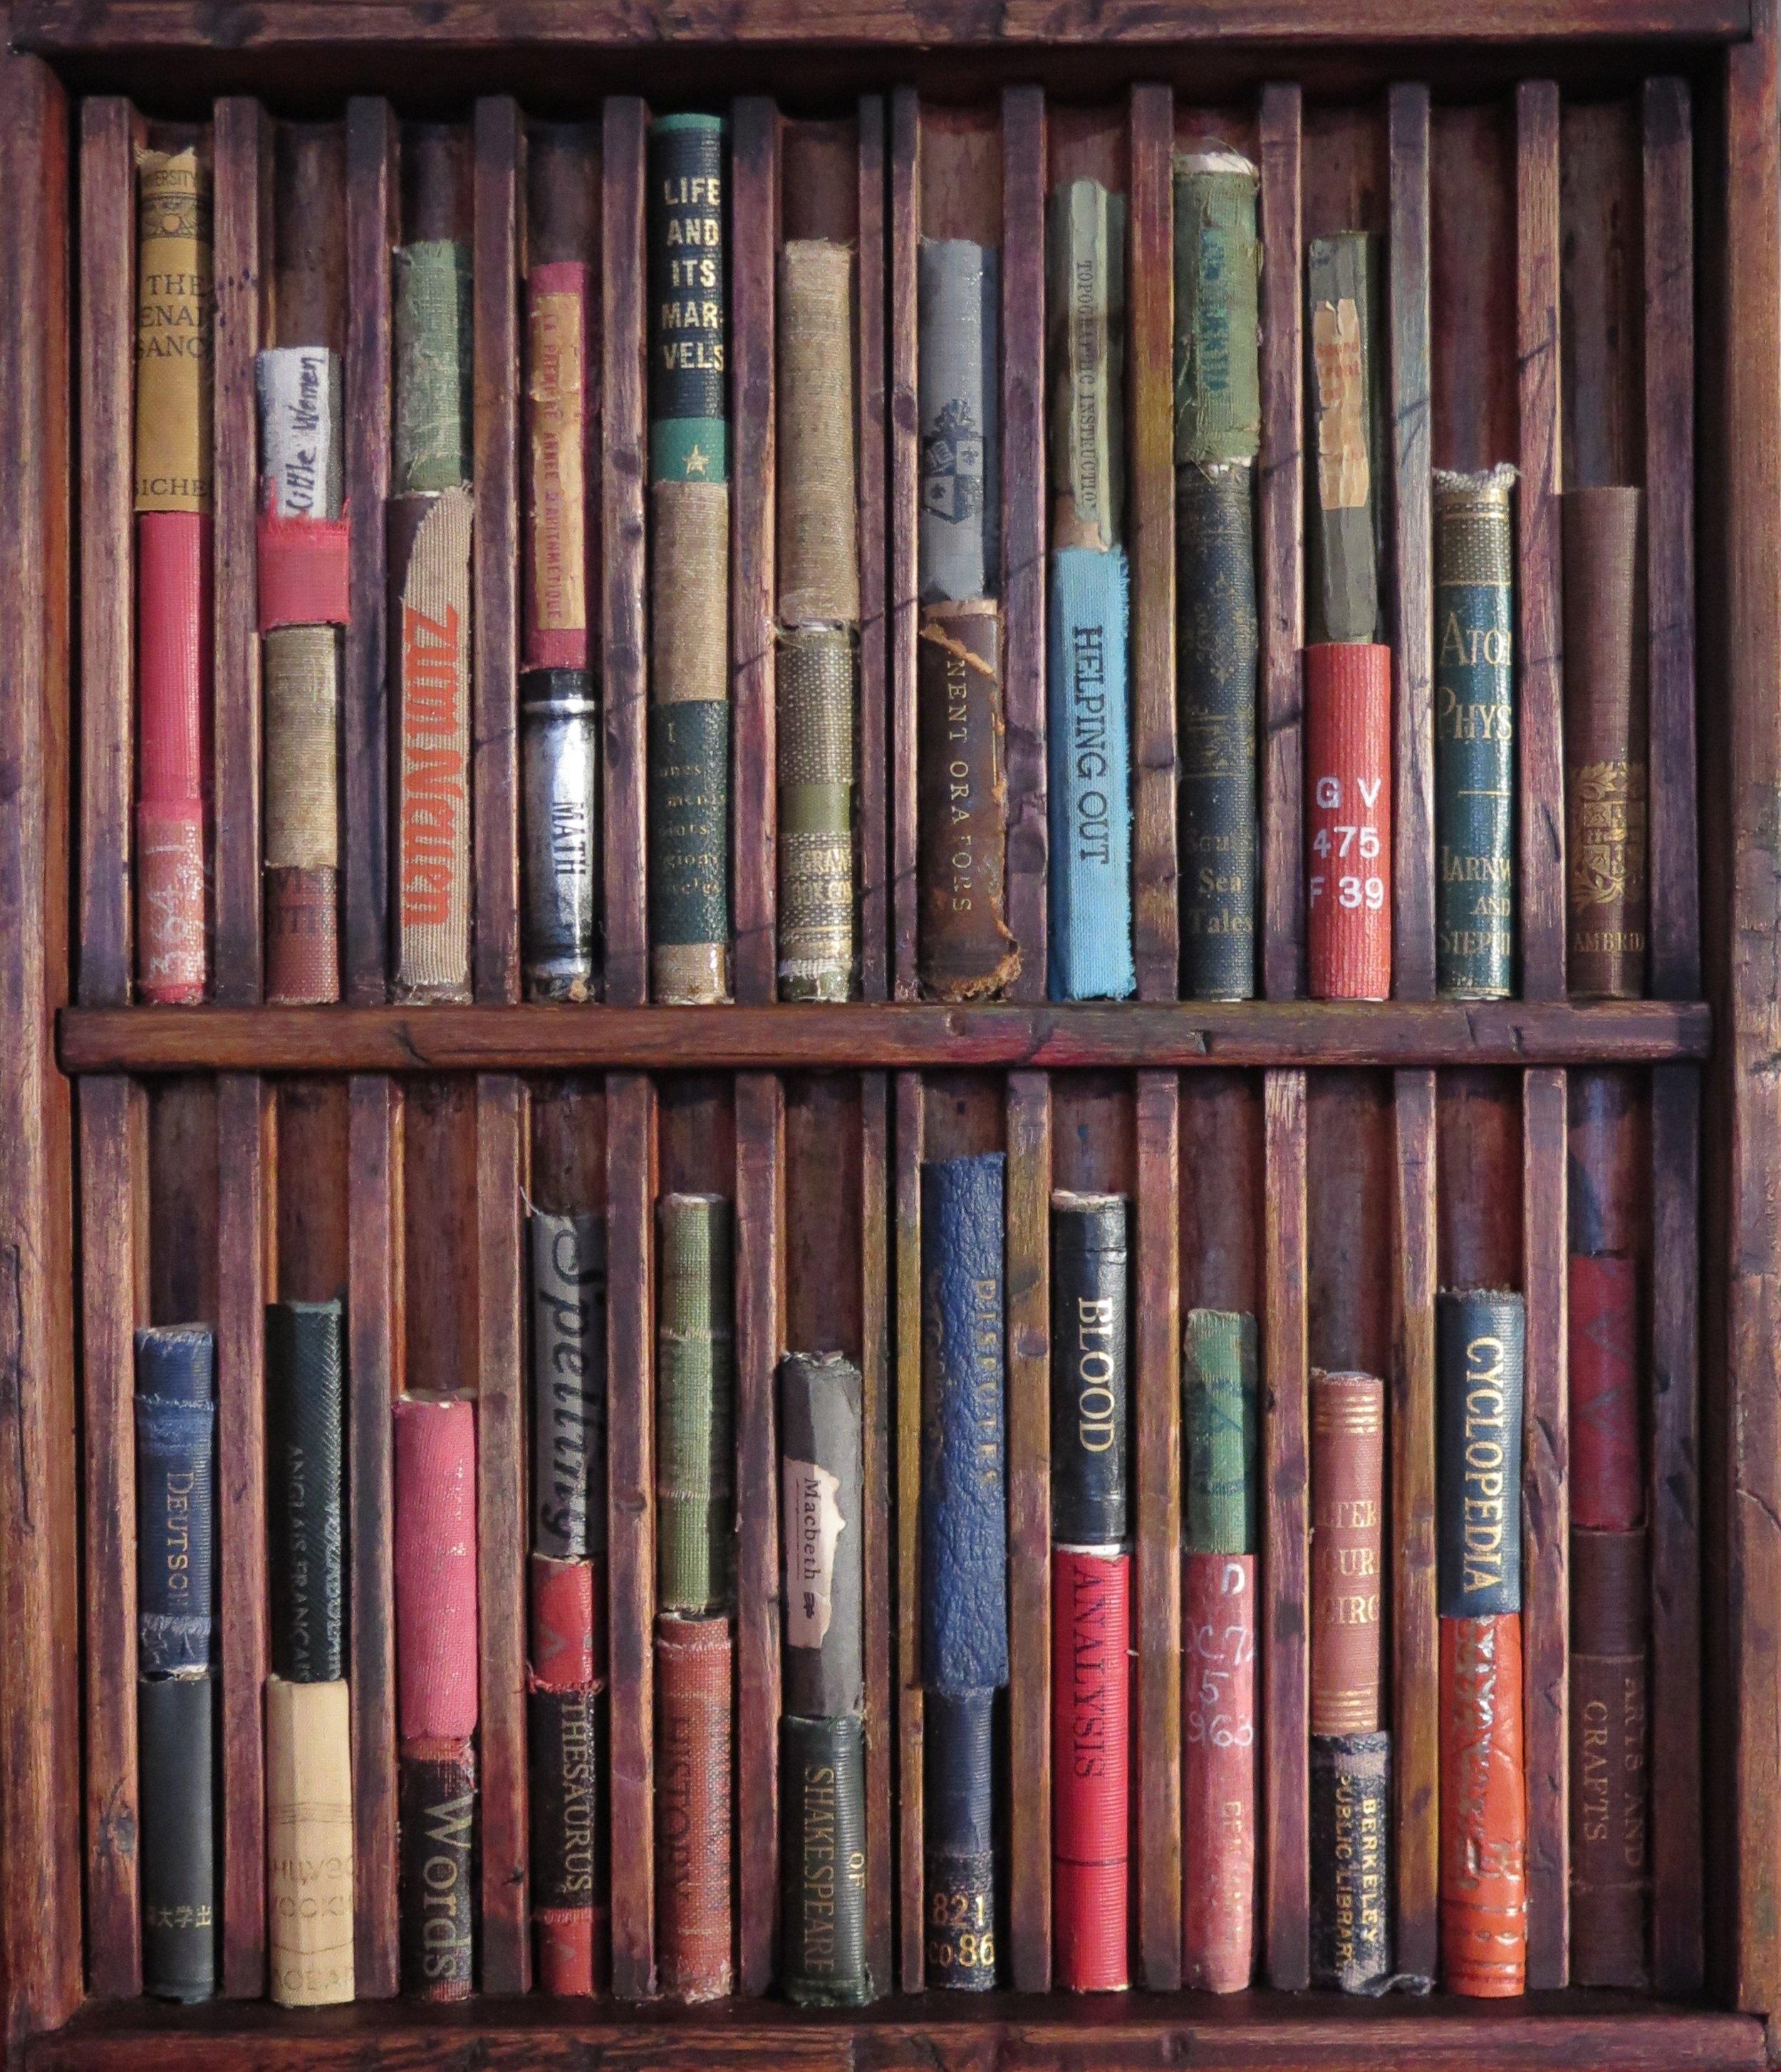 Library for Lilliputians